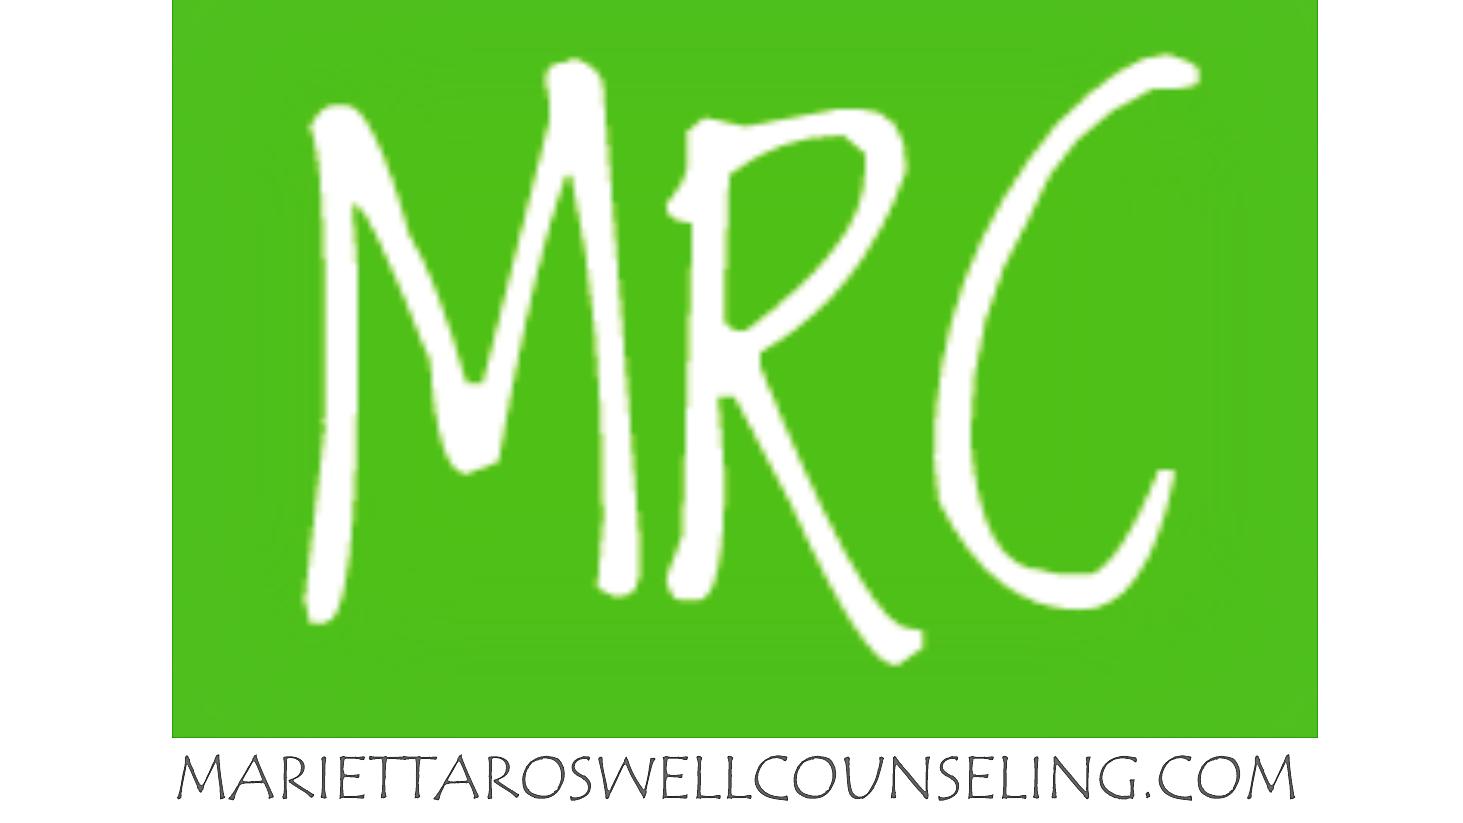 Marietta Roswell Counseling, LPC, Licensed Professional Counselor in Marietta, GA